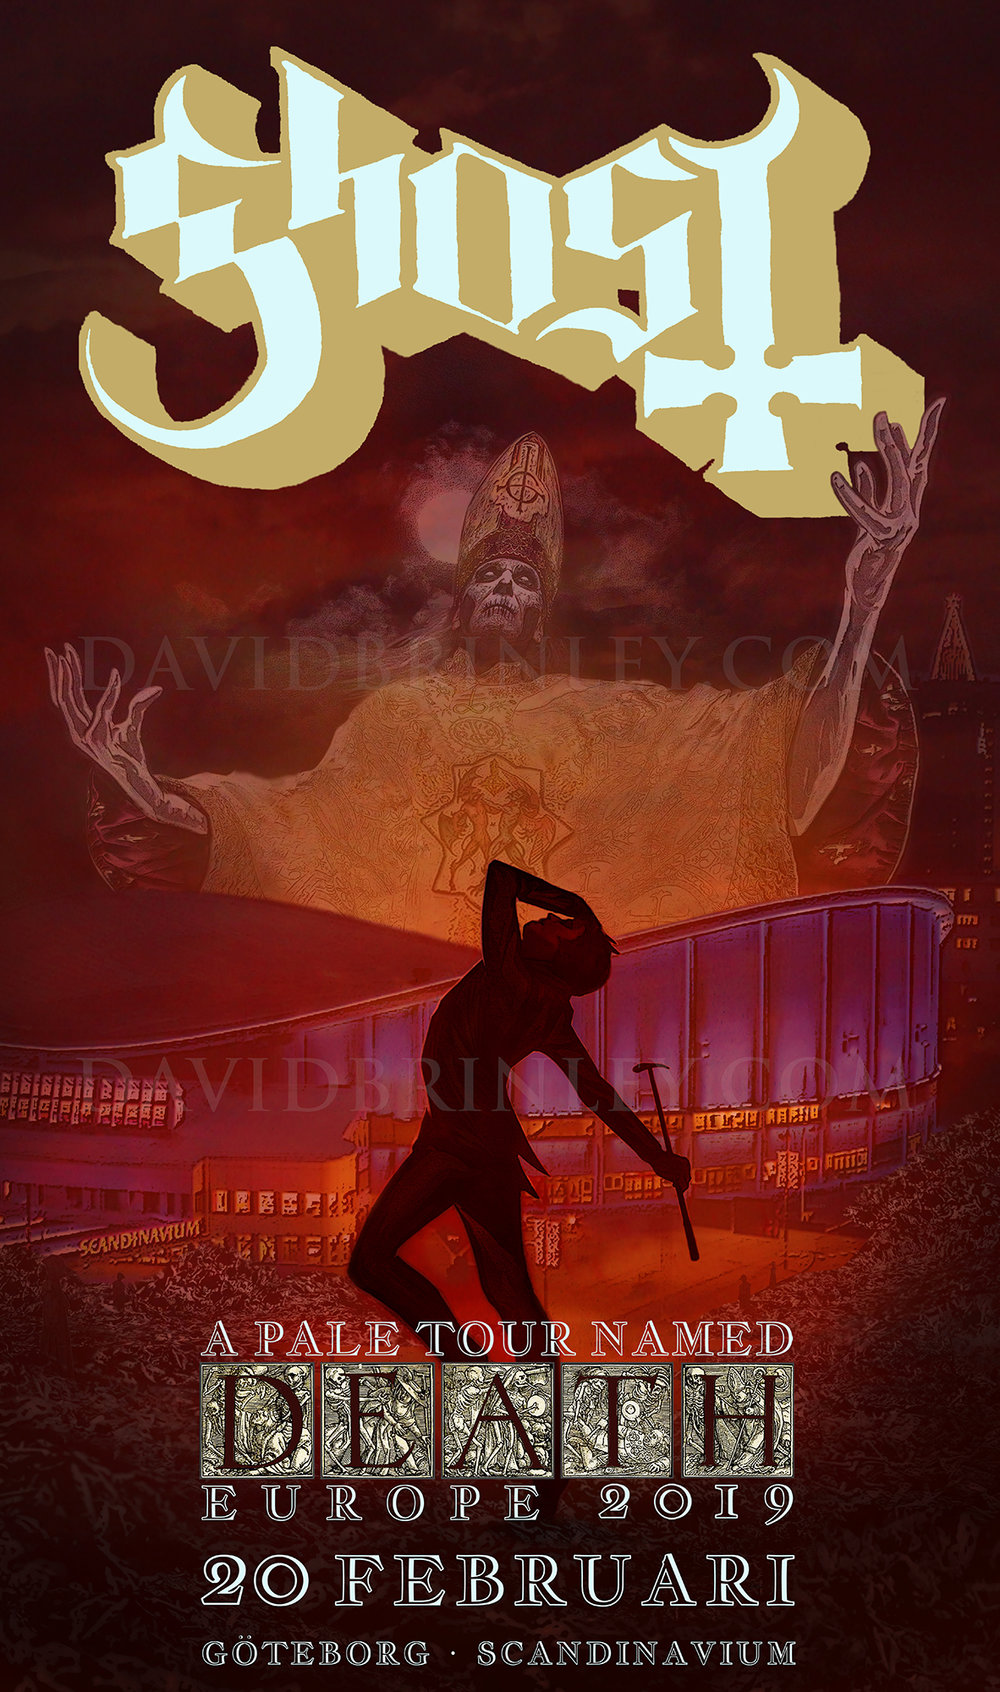 GHOST | Gothenburg Sweden Scandinavium | February 20, 2019   A Pale Tour Named Death Official poster  David M. Brinley | Illustrator Designer  Acrylic and Digital